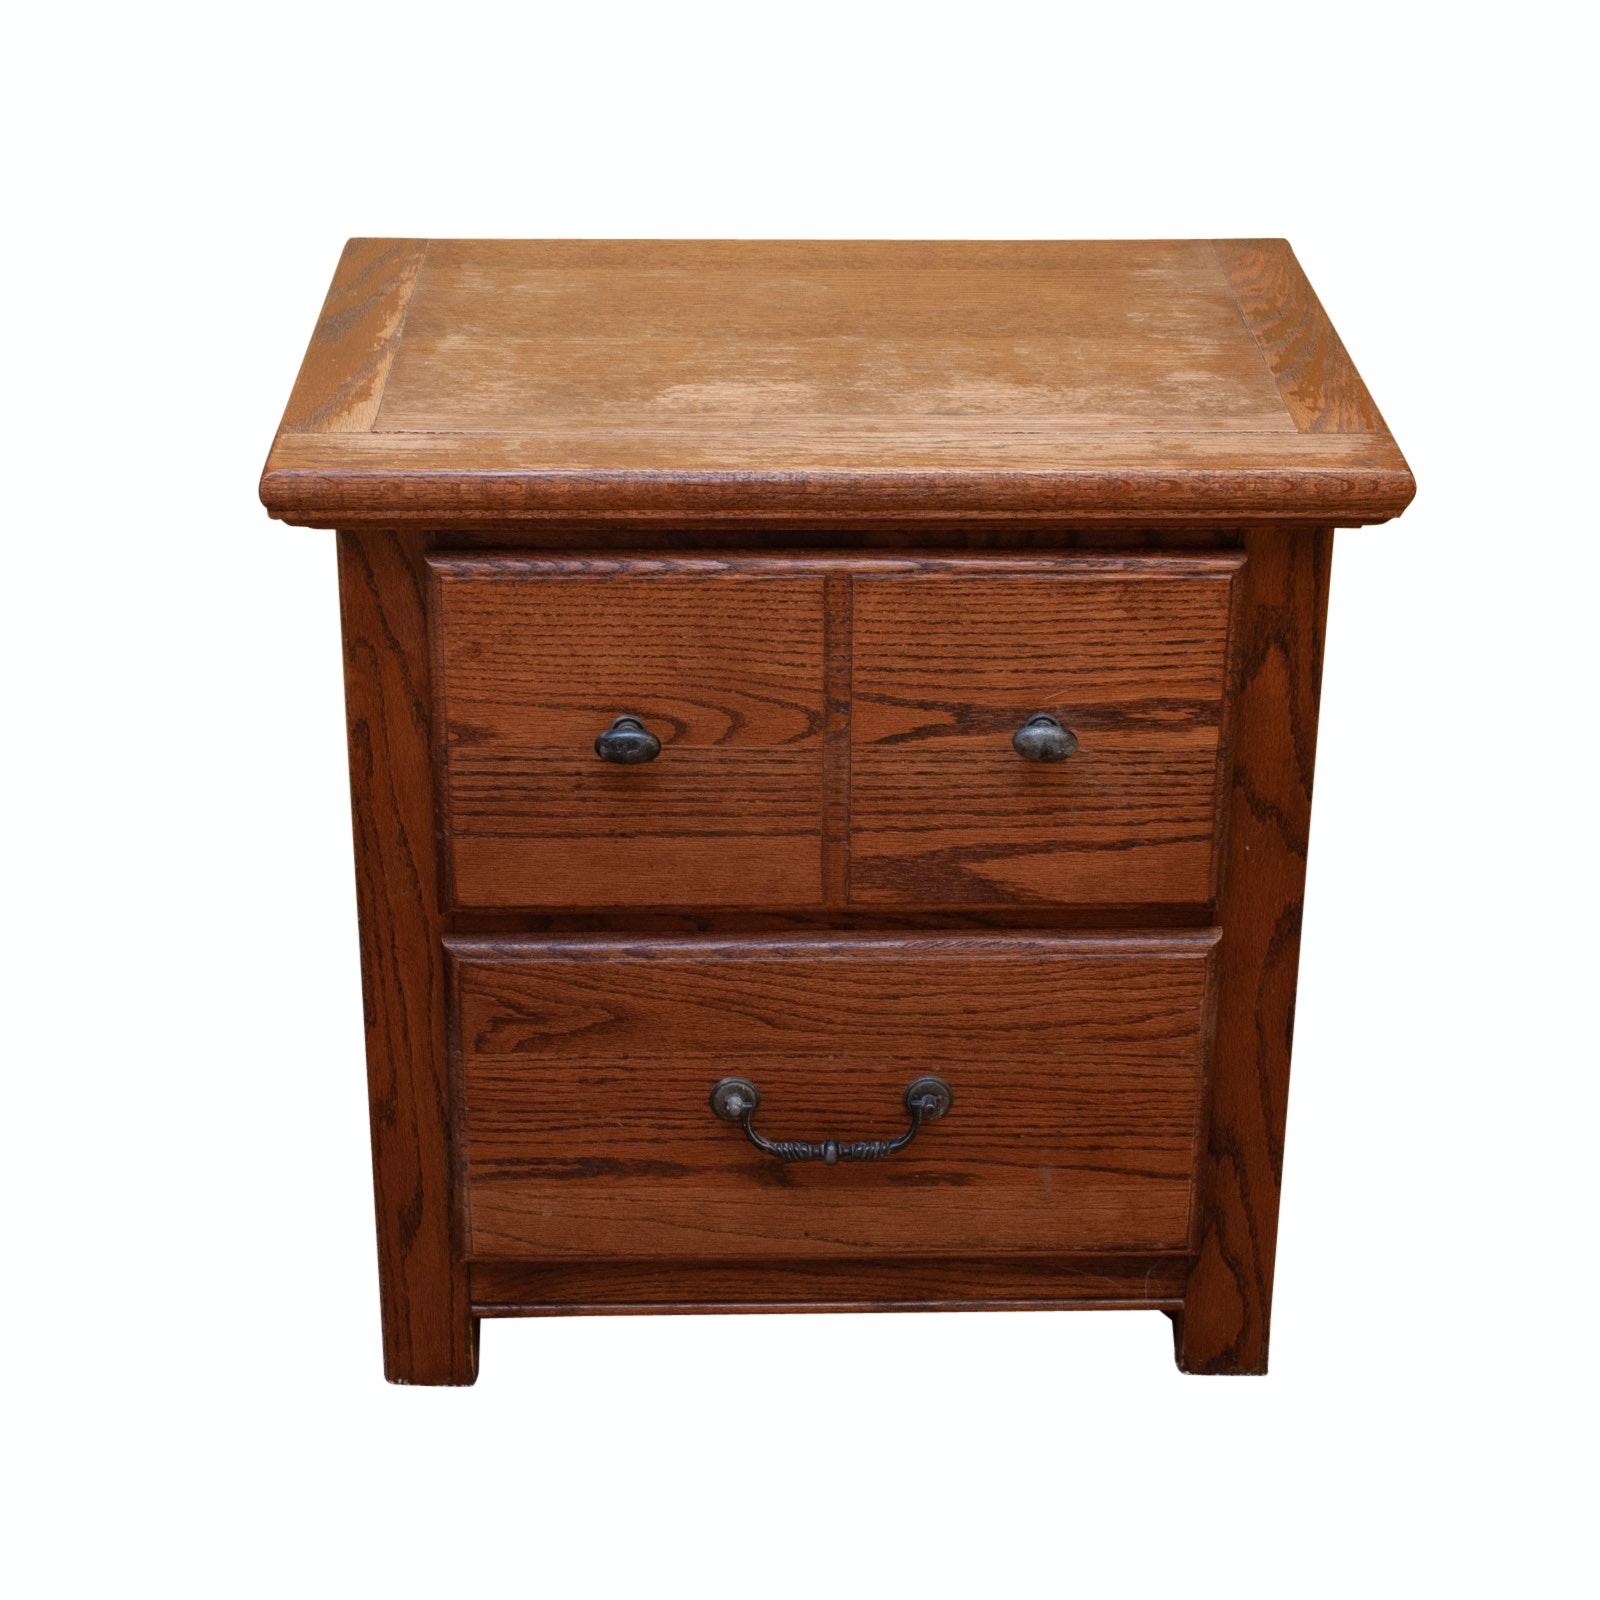 Wooden Oak Style Night Stand